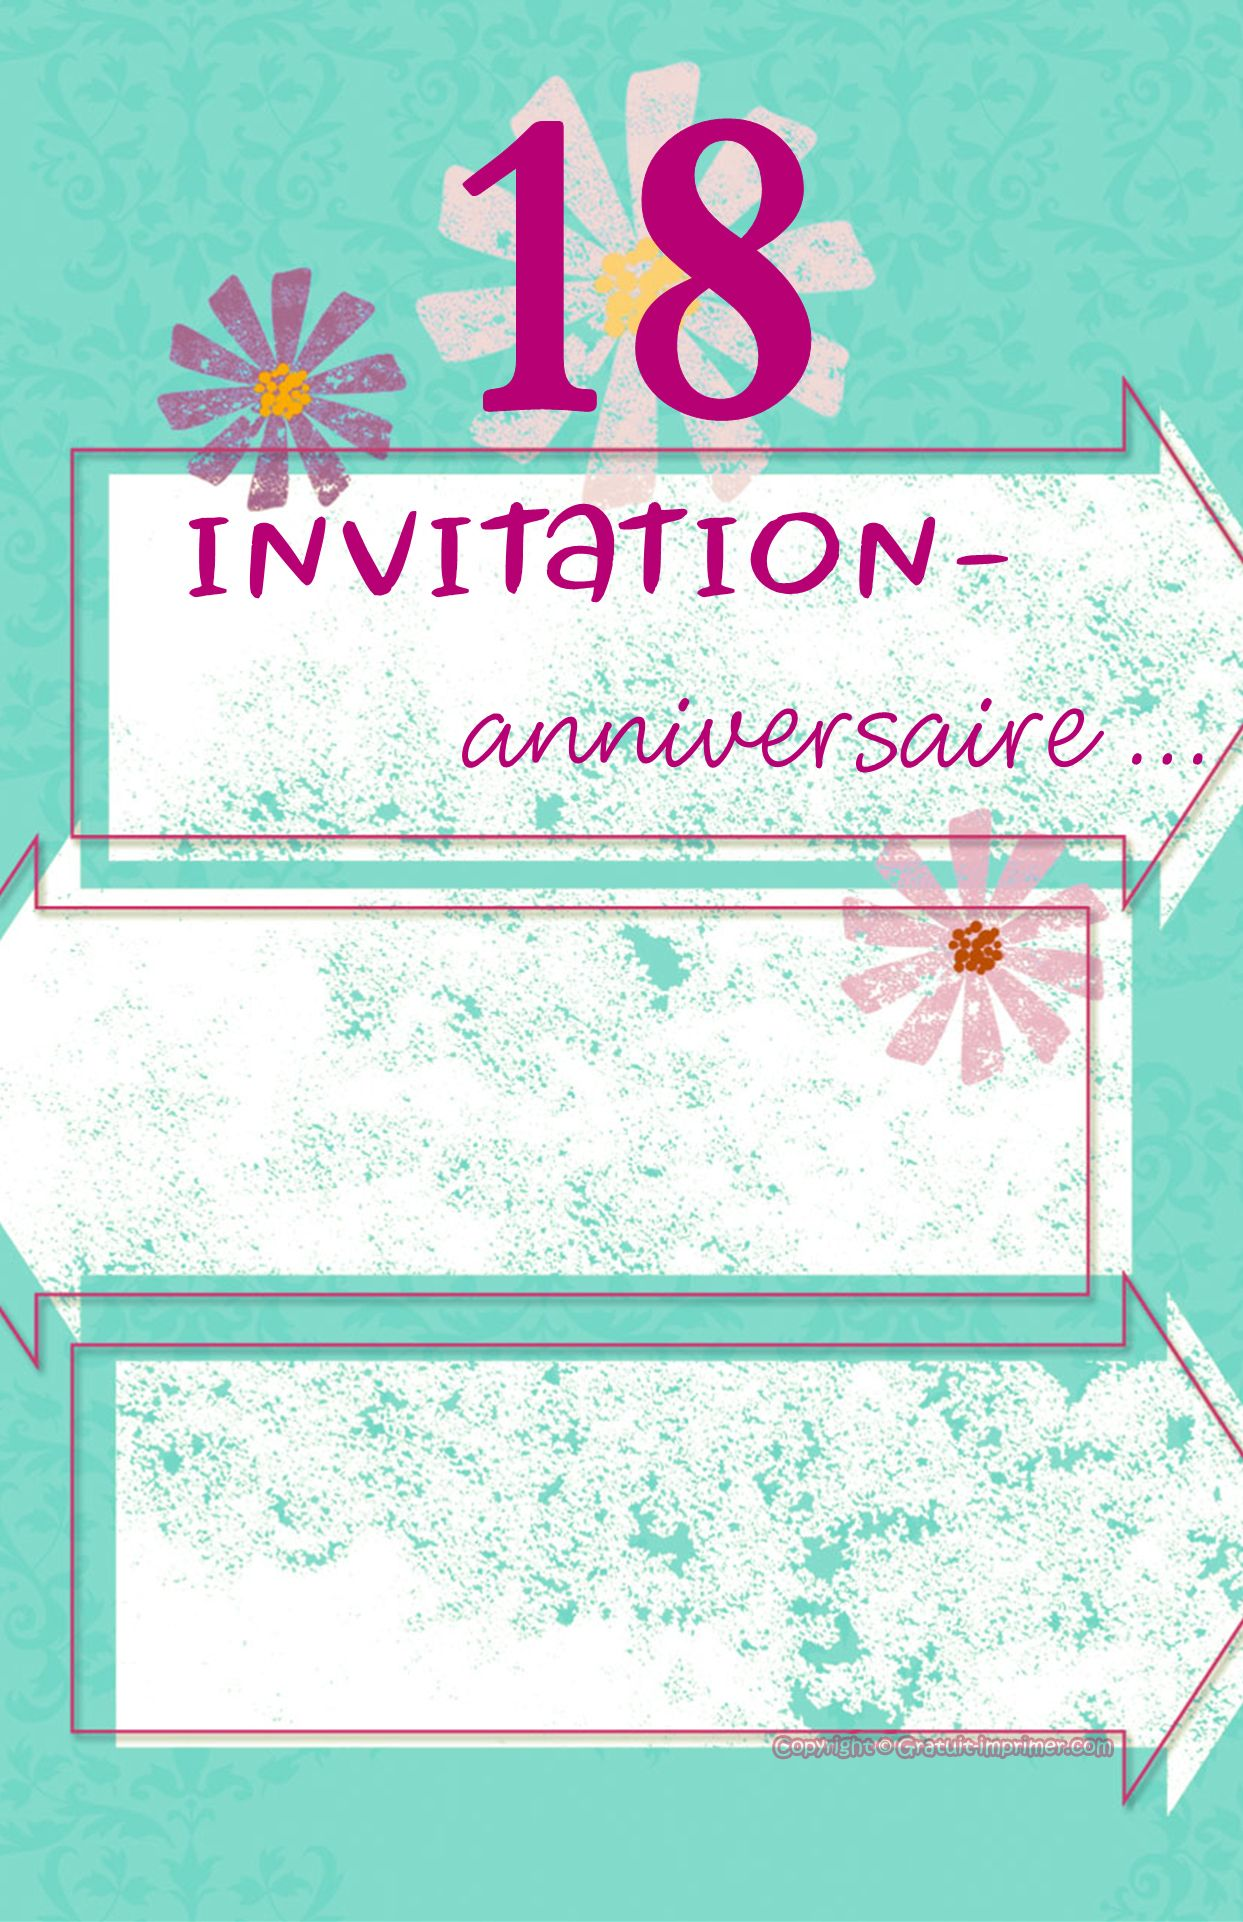 Carte Invitation Anniversaire 18 Ans Fille Jpg 1243 1922 Anniversary Invitations Invitations 18 Year Anniversary